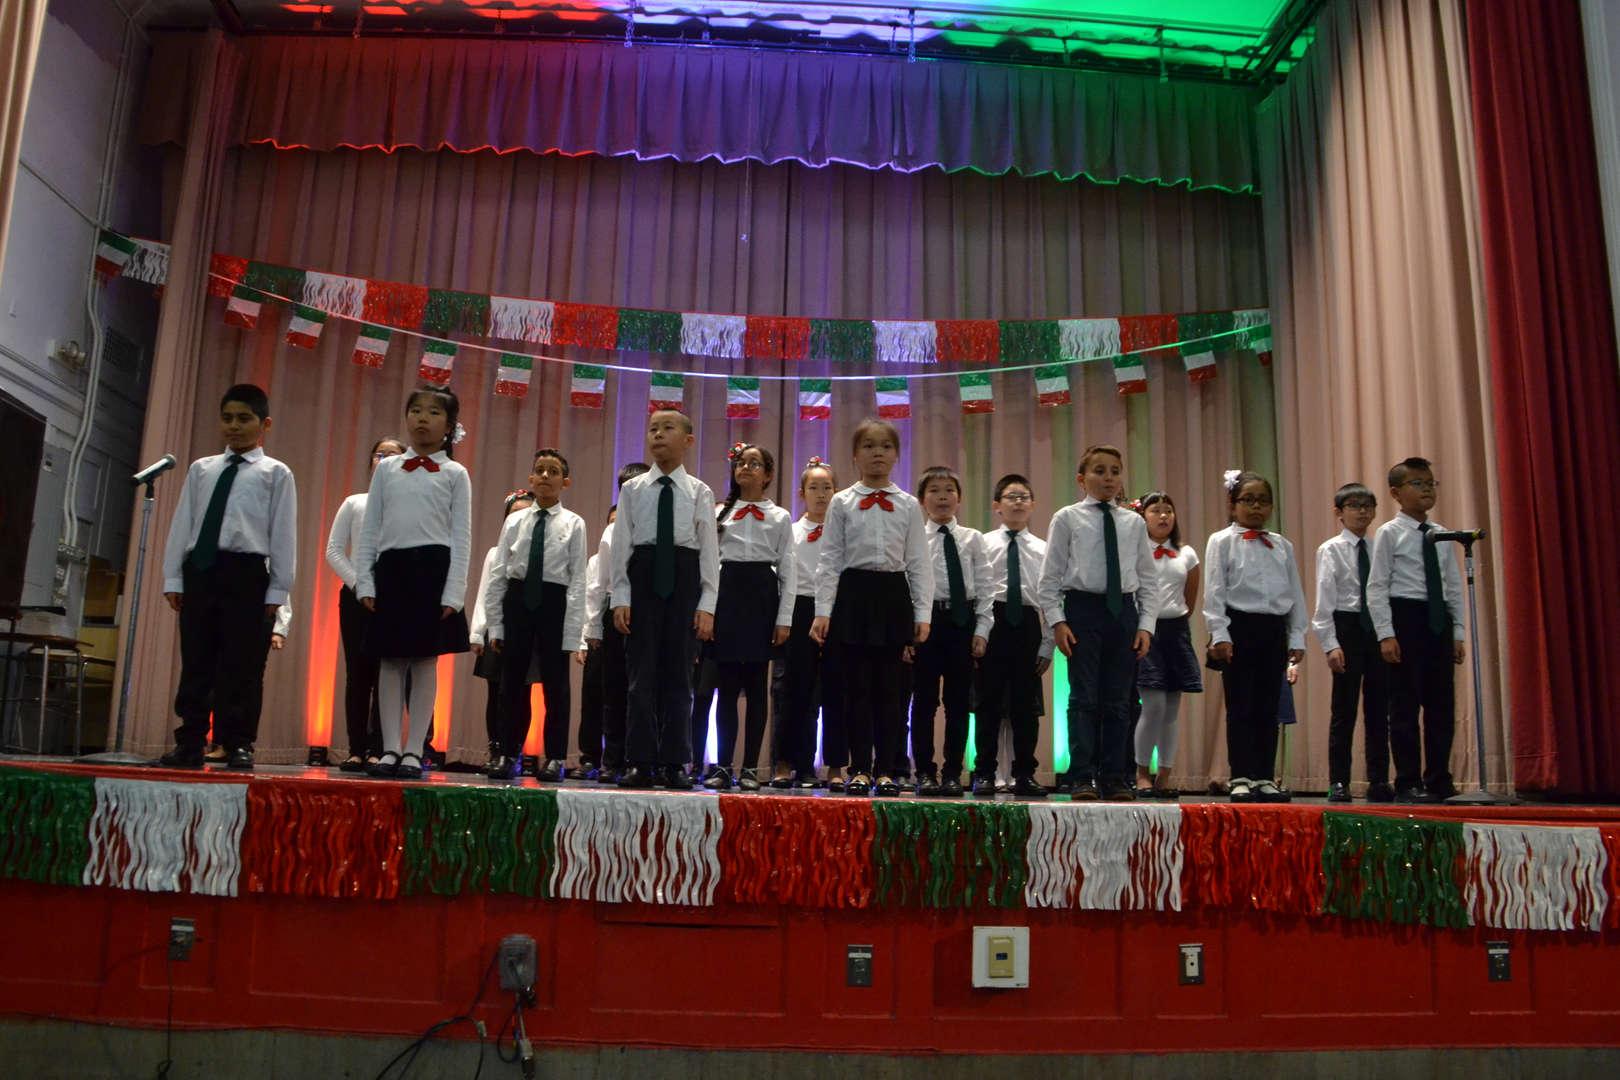 Il Canto Degli Italiani(Italian National Anthem)-MS. Anna D'Agostino, Class 5-4